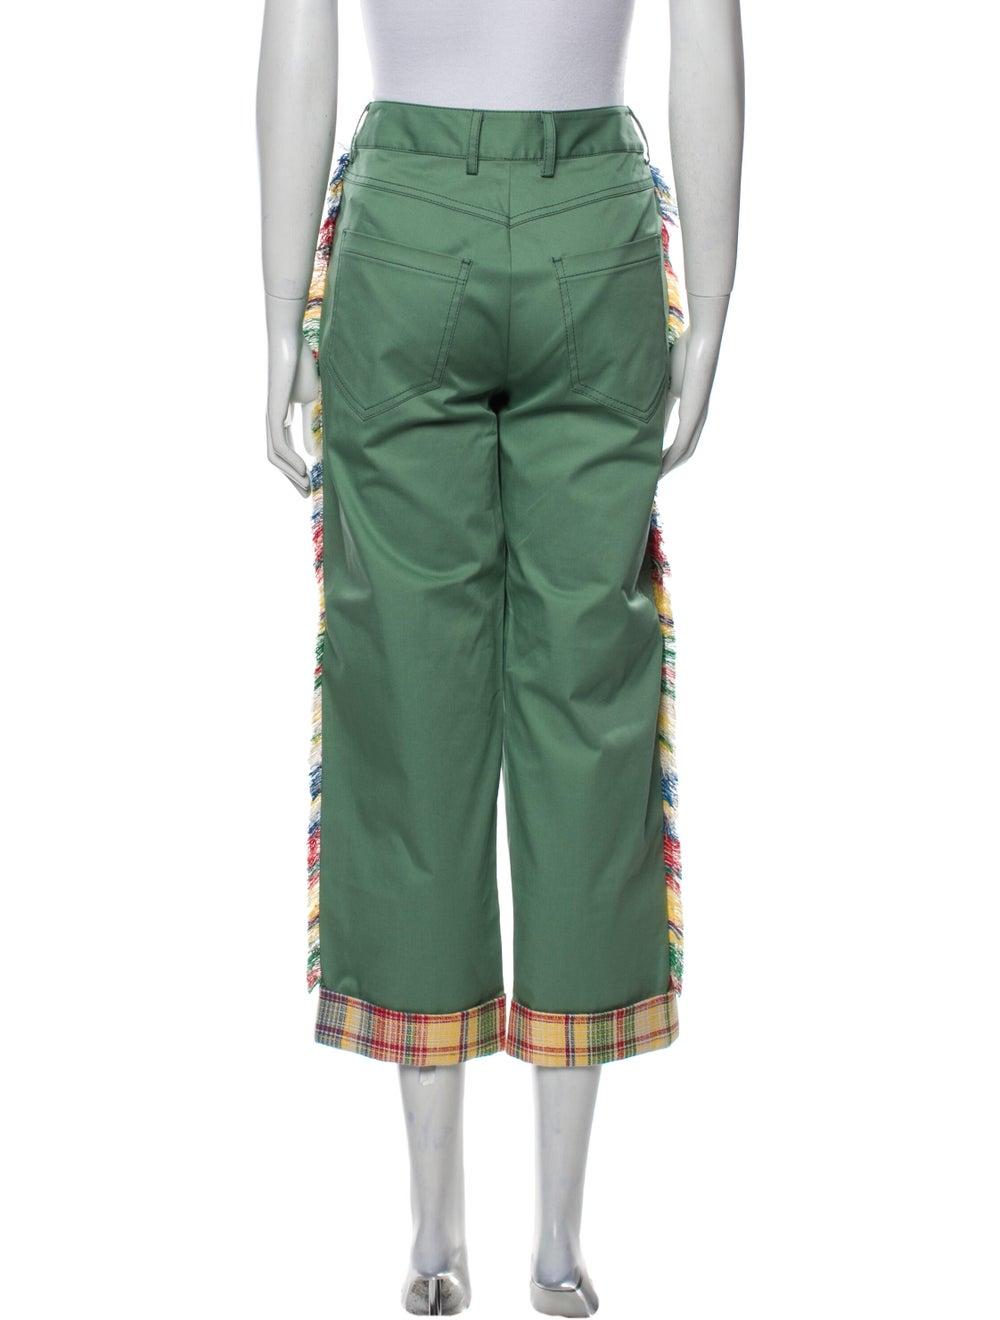 Monse Plaid Print Straight Leg Pants w/ Tags Green - image 3